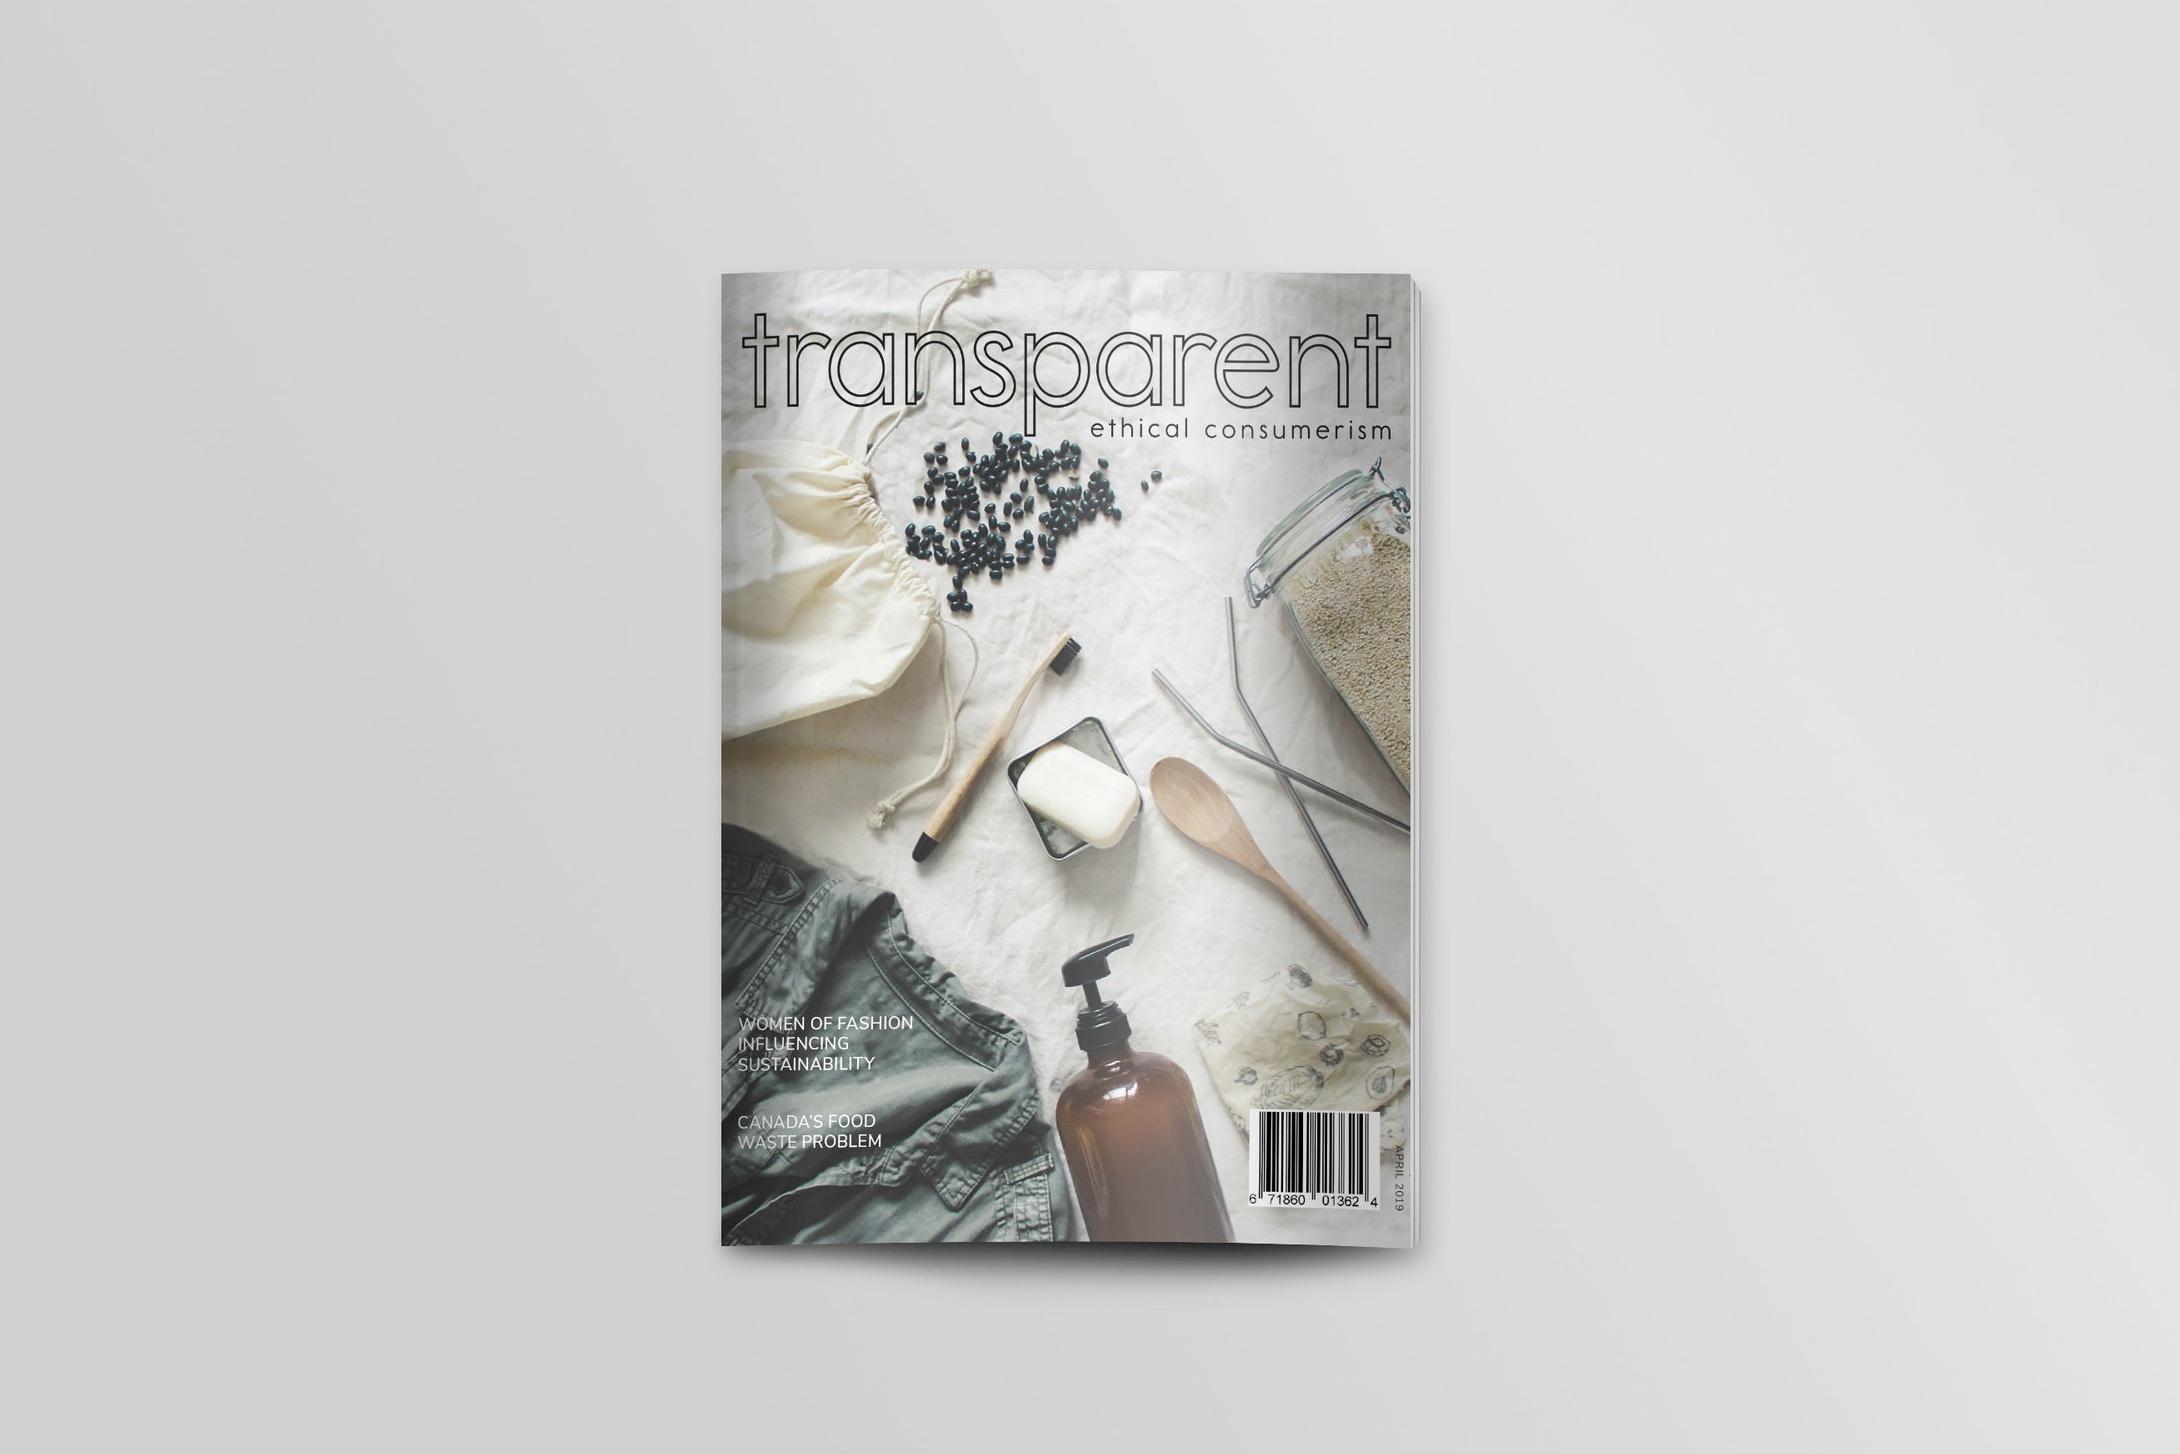 magazine_mockup_cover.jpg